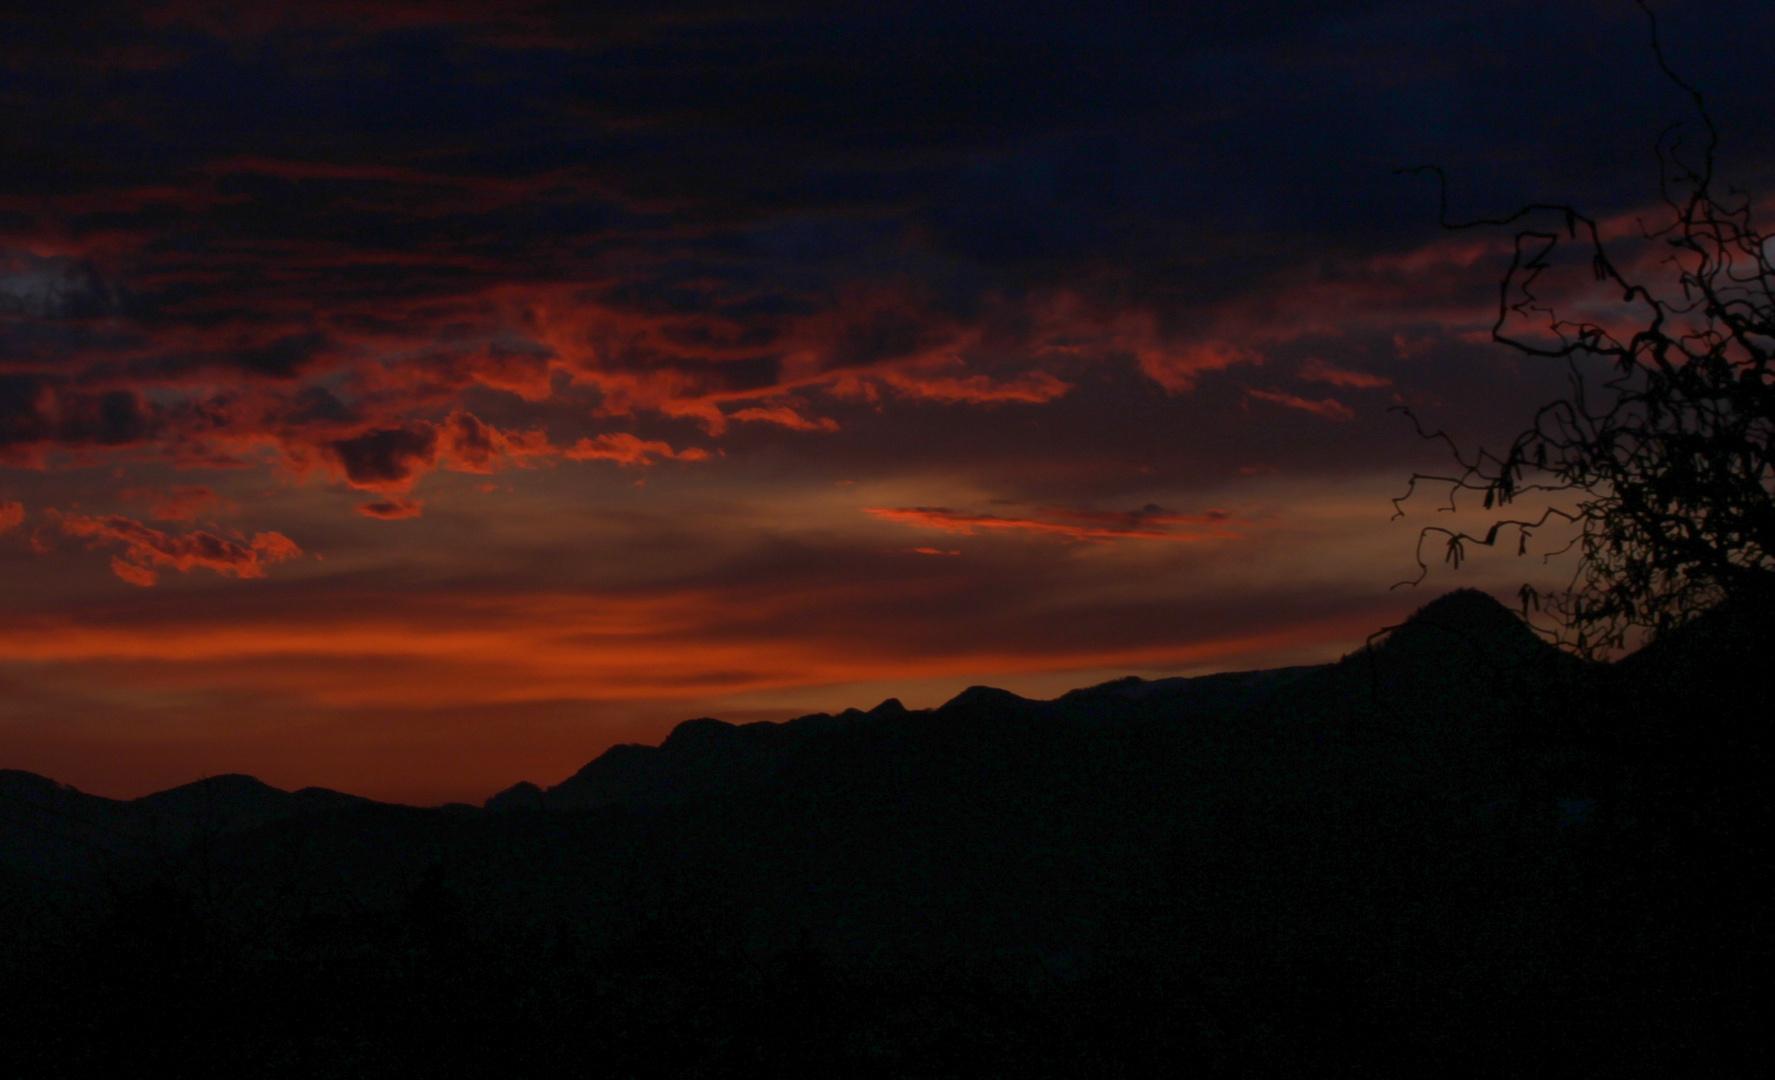 Sonnenaufgang phasen 2